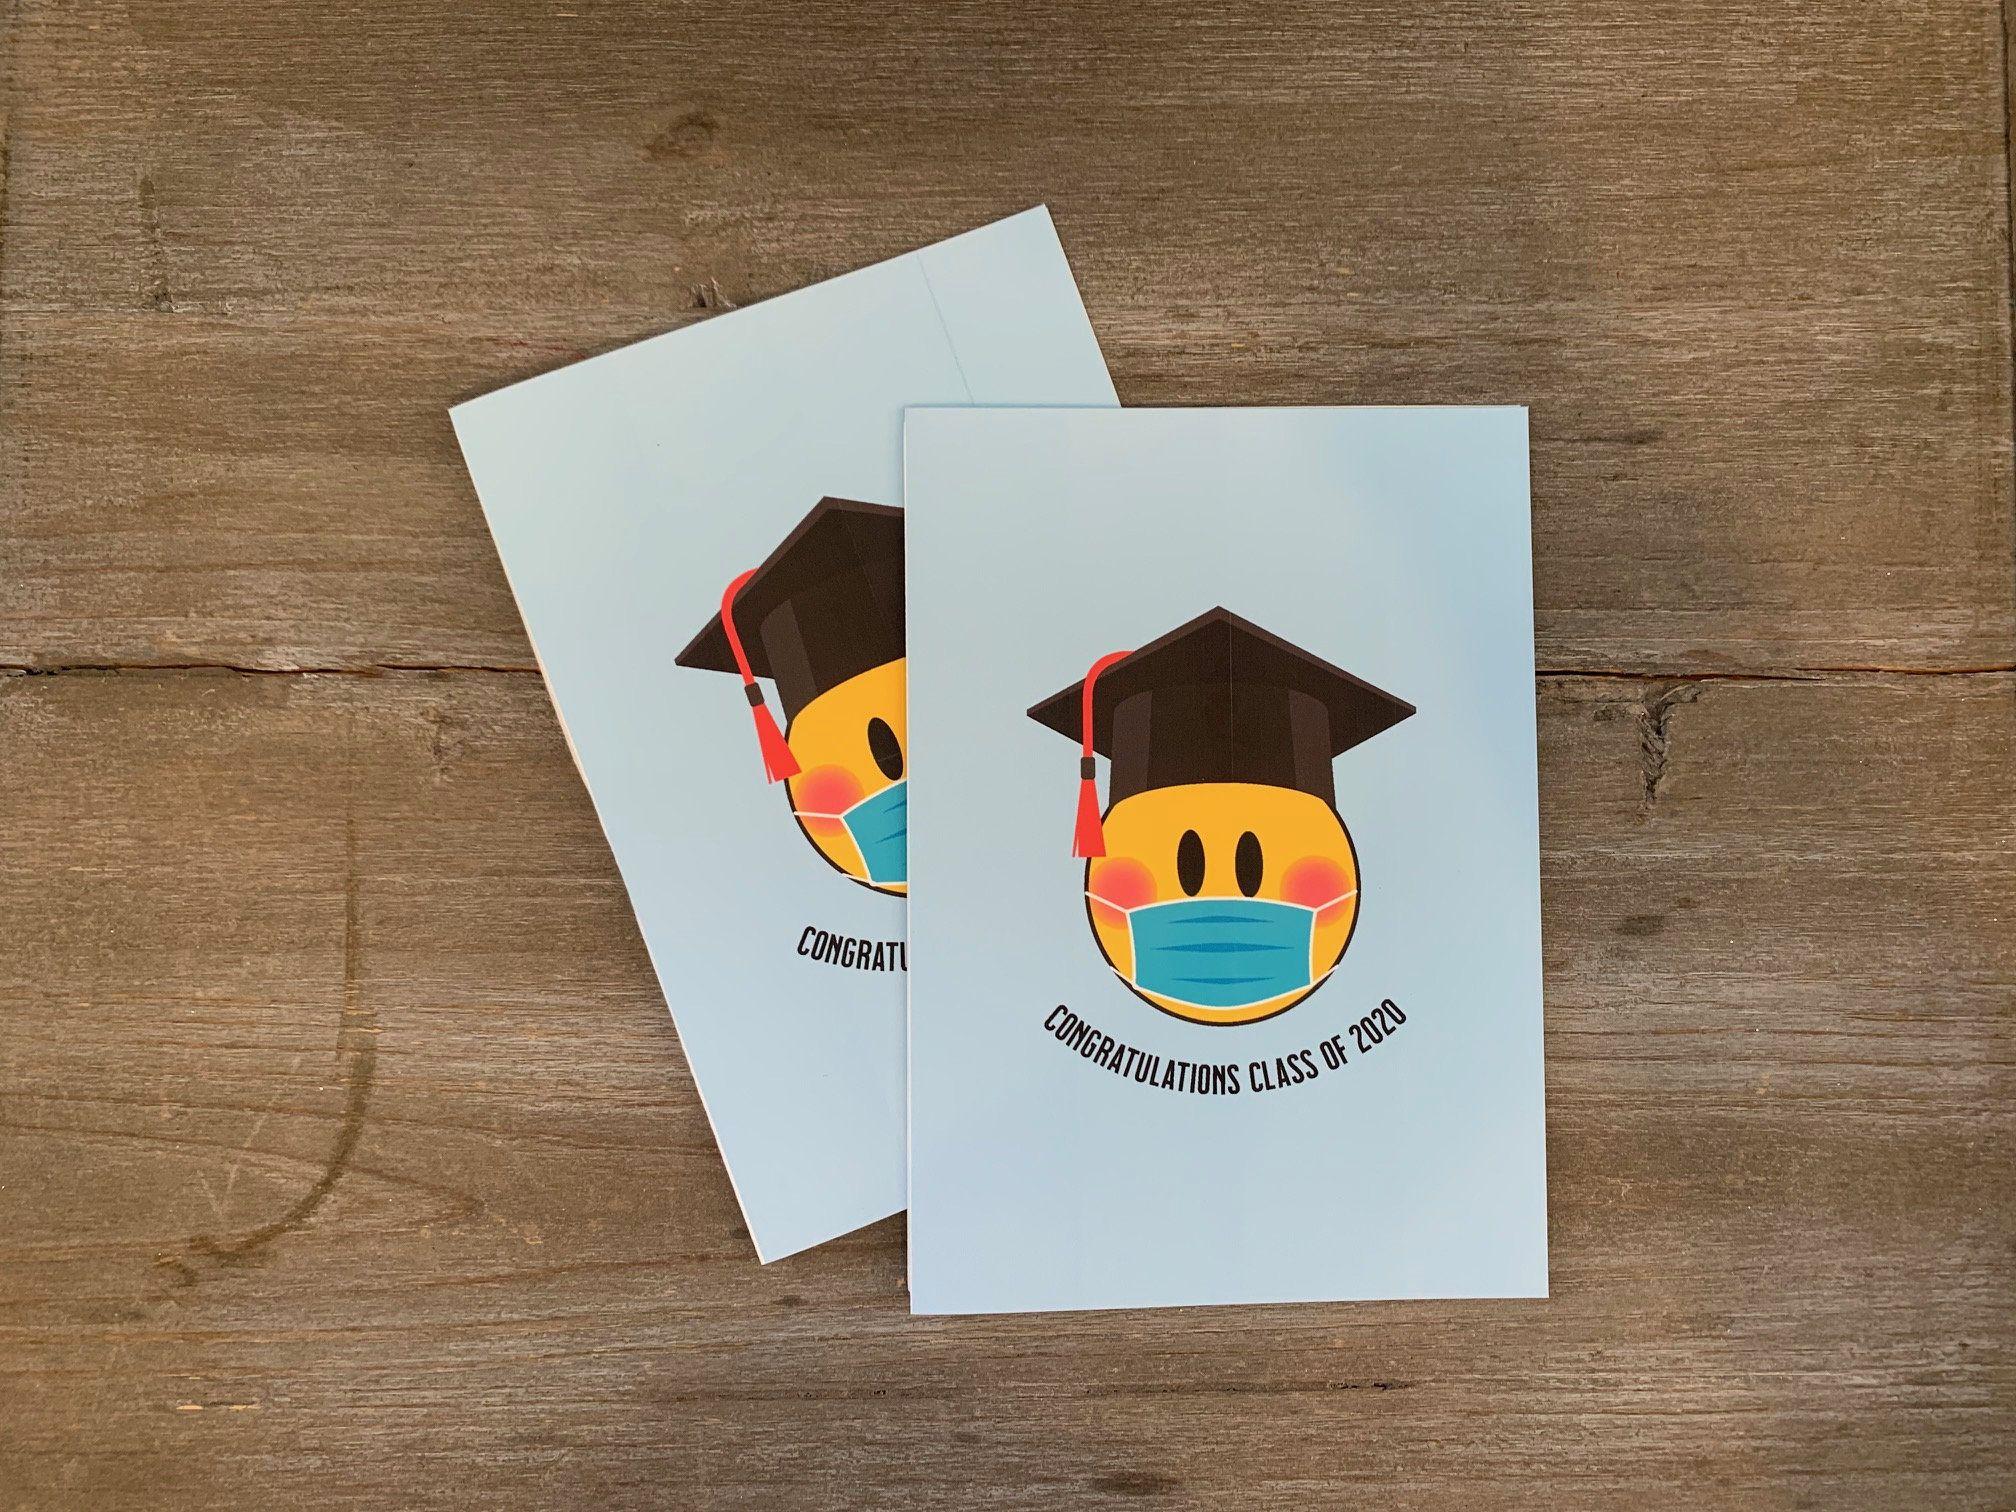 Congratulations Class Of 2020 Mask Emoji Graduation Card Etsy In 2020 Graduation Cards Class Of 2020 Cards